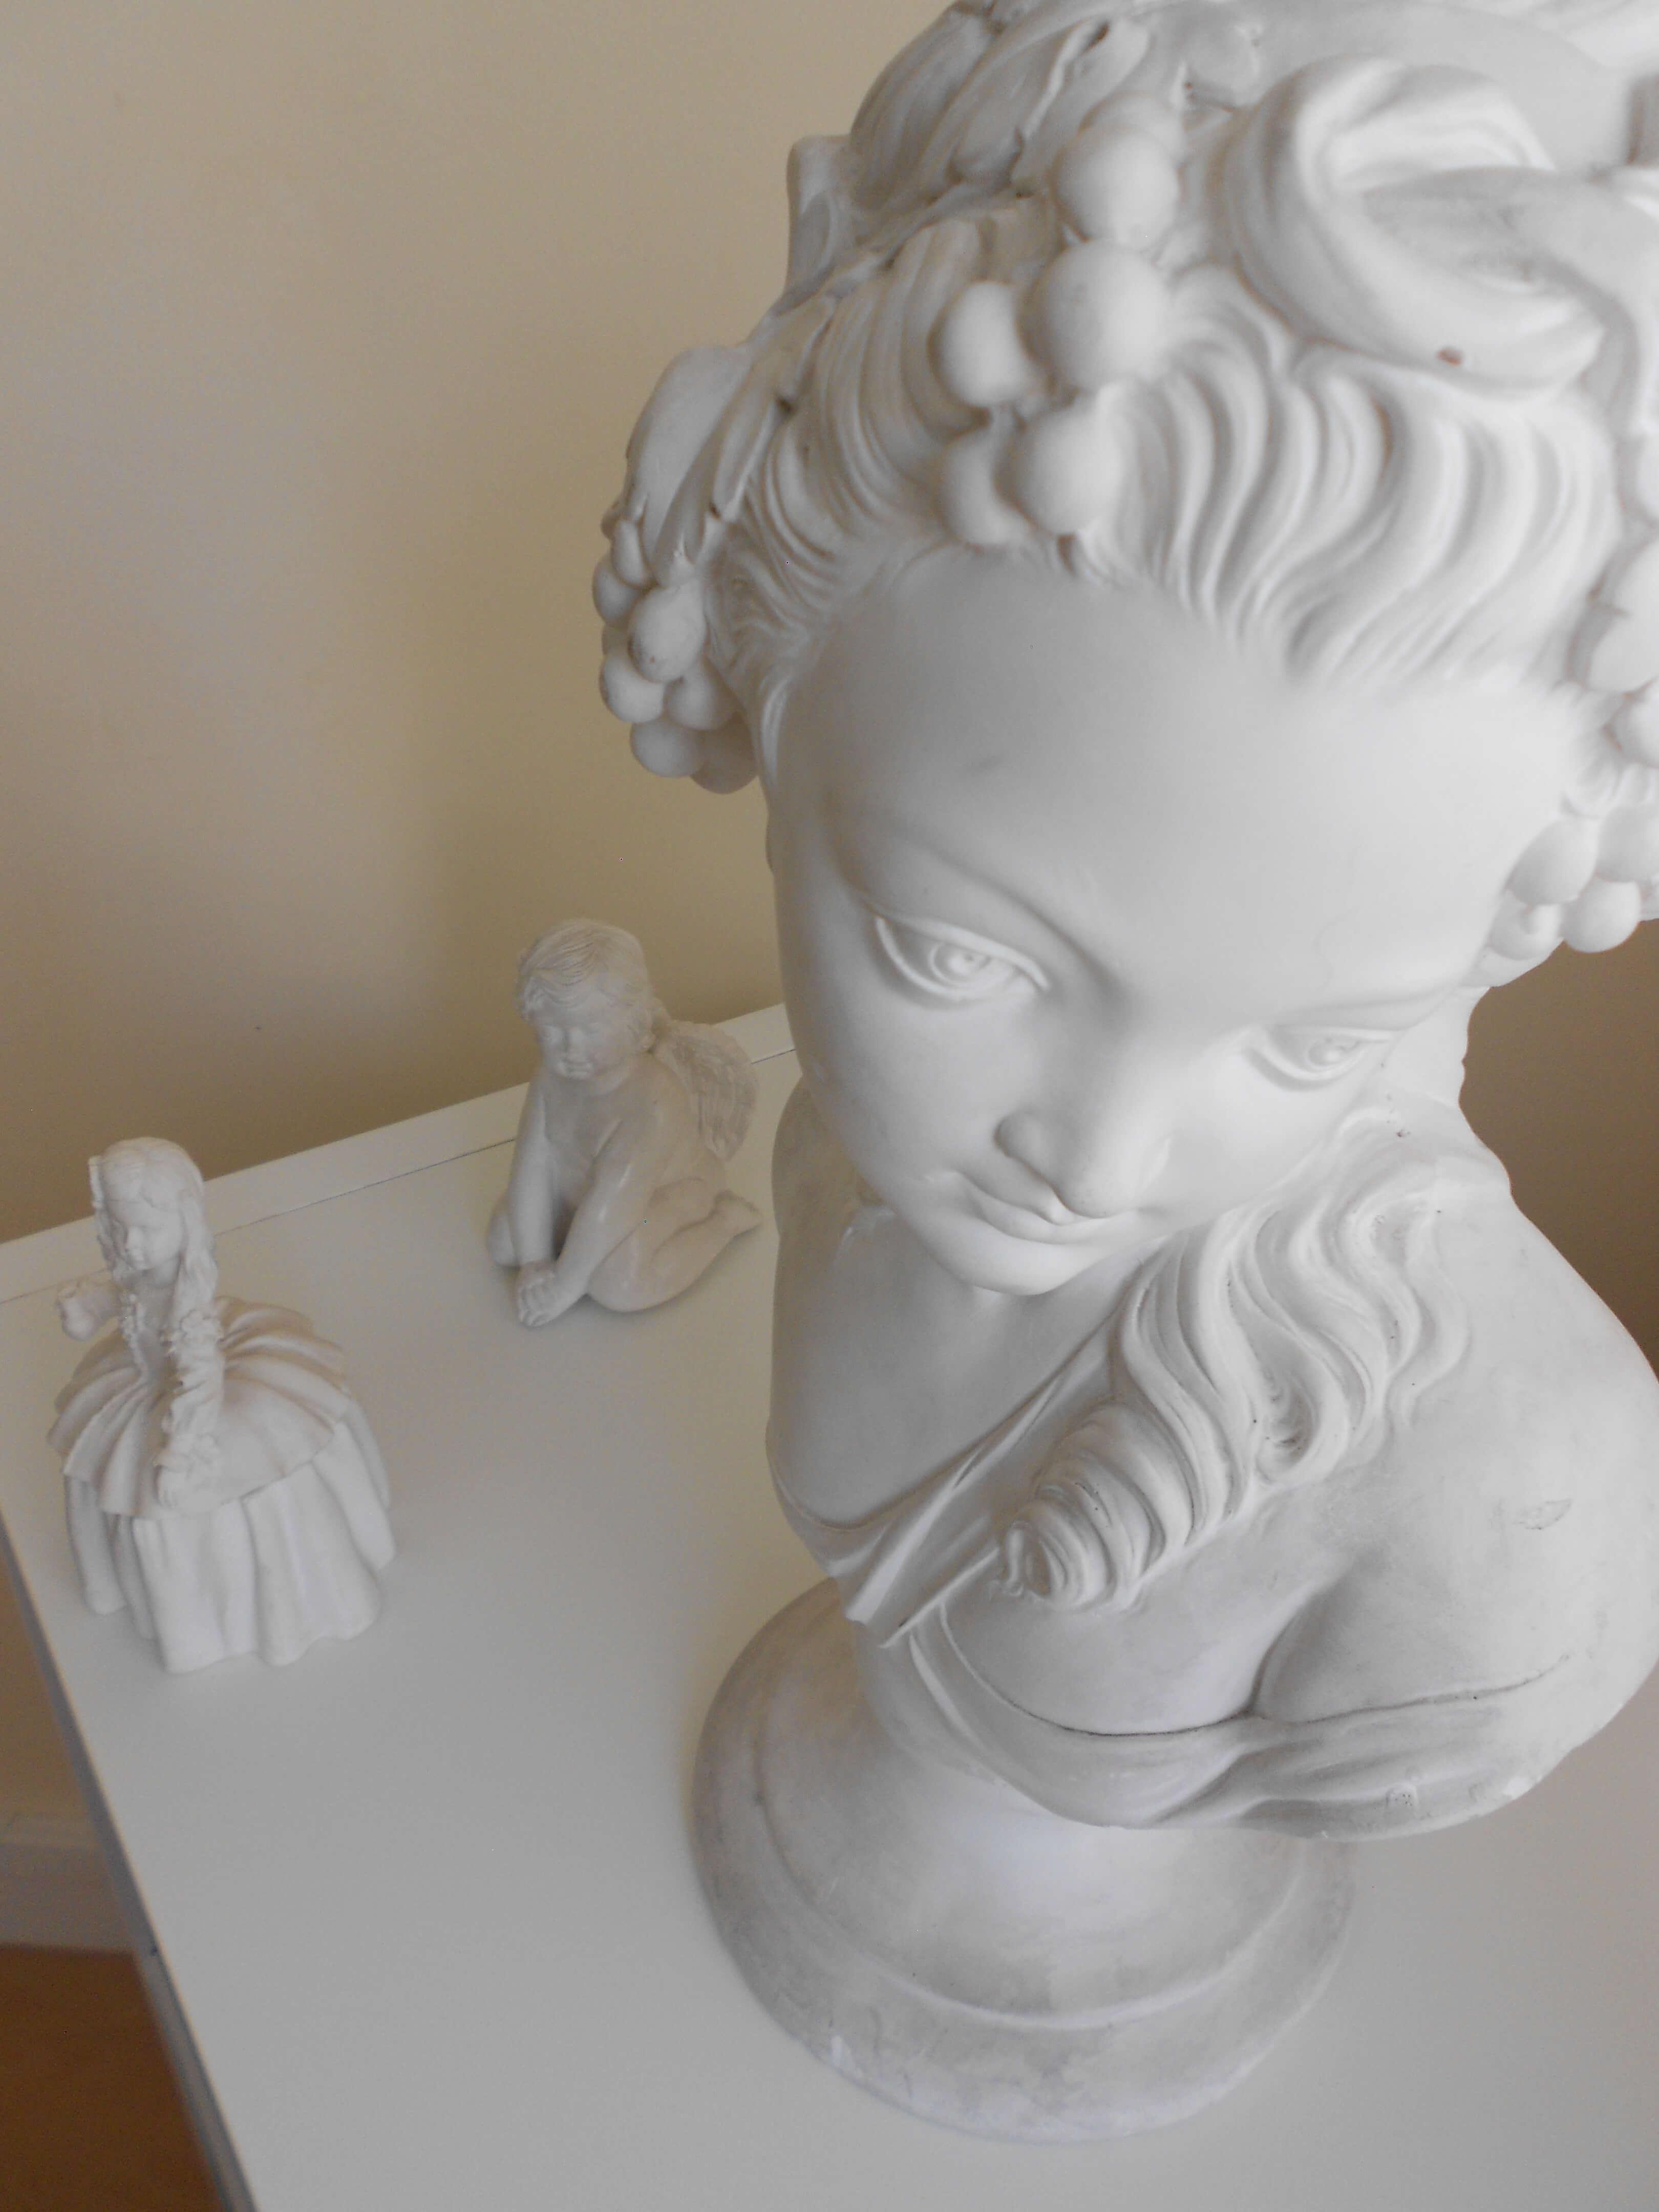 Academia-de-arte-Marta-Caravaca-curso-escultura